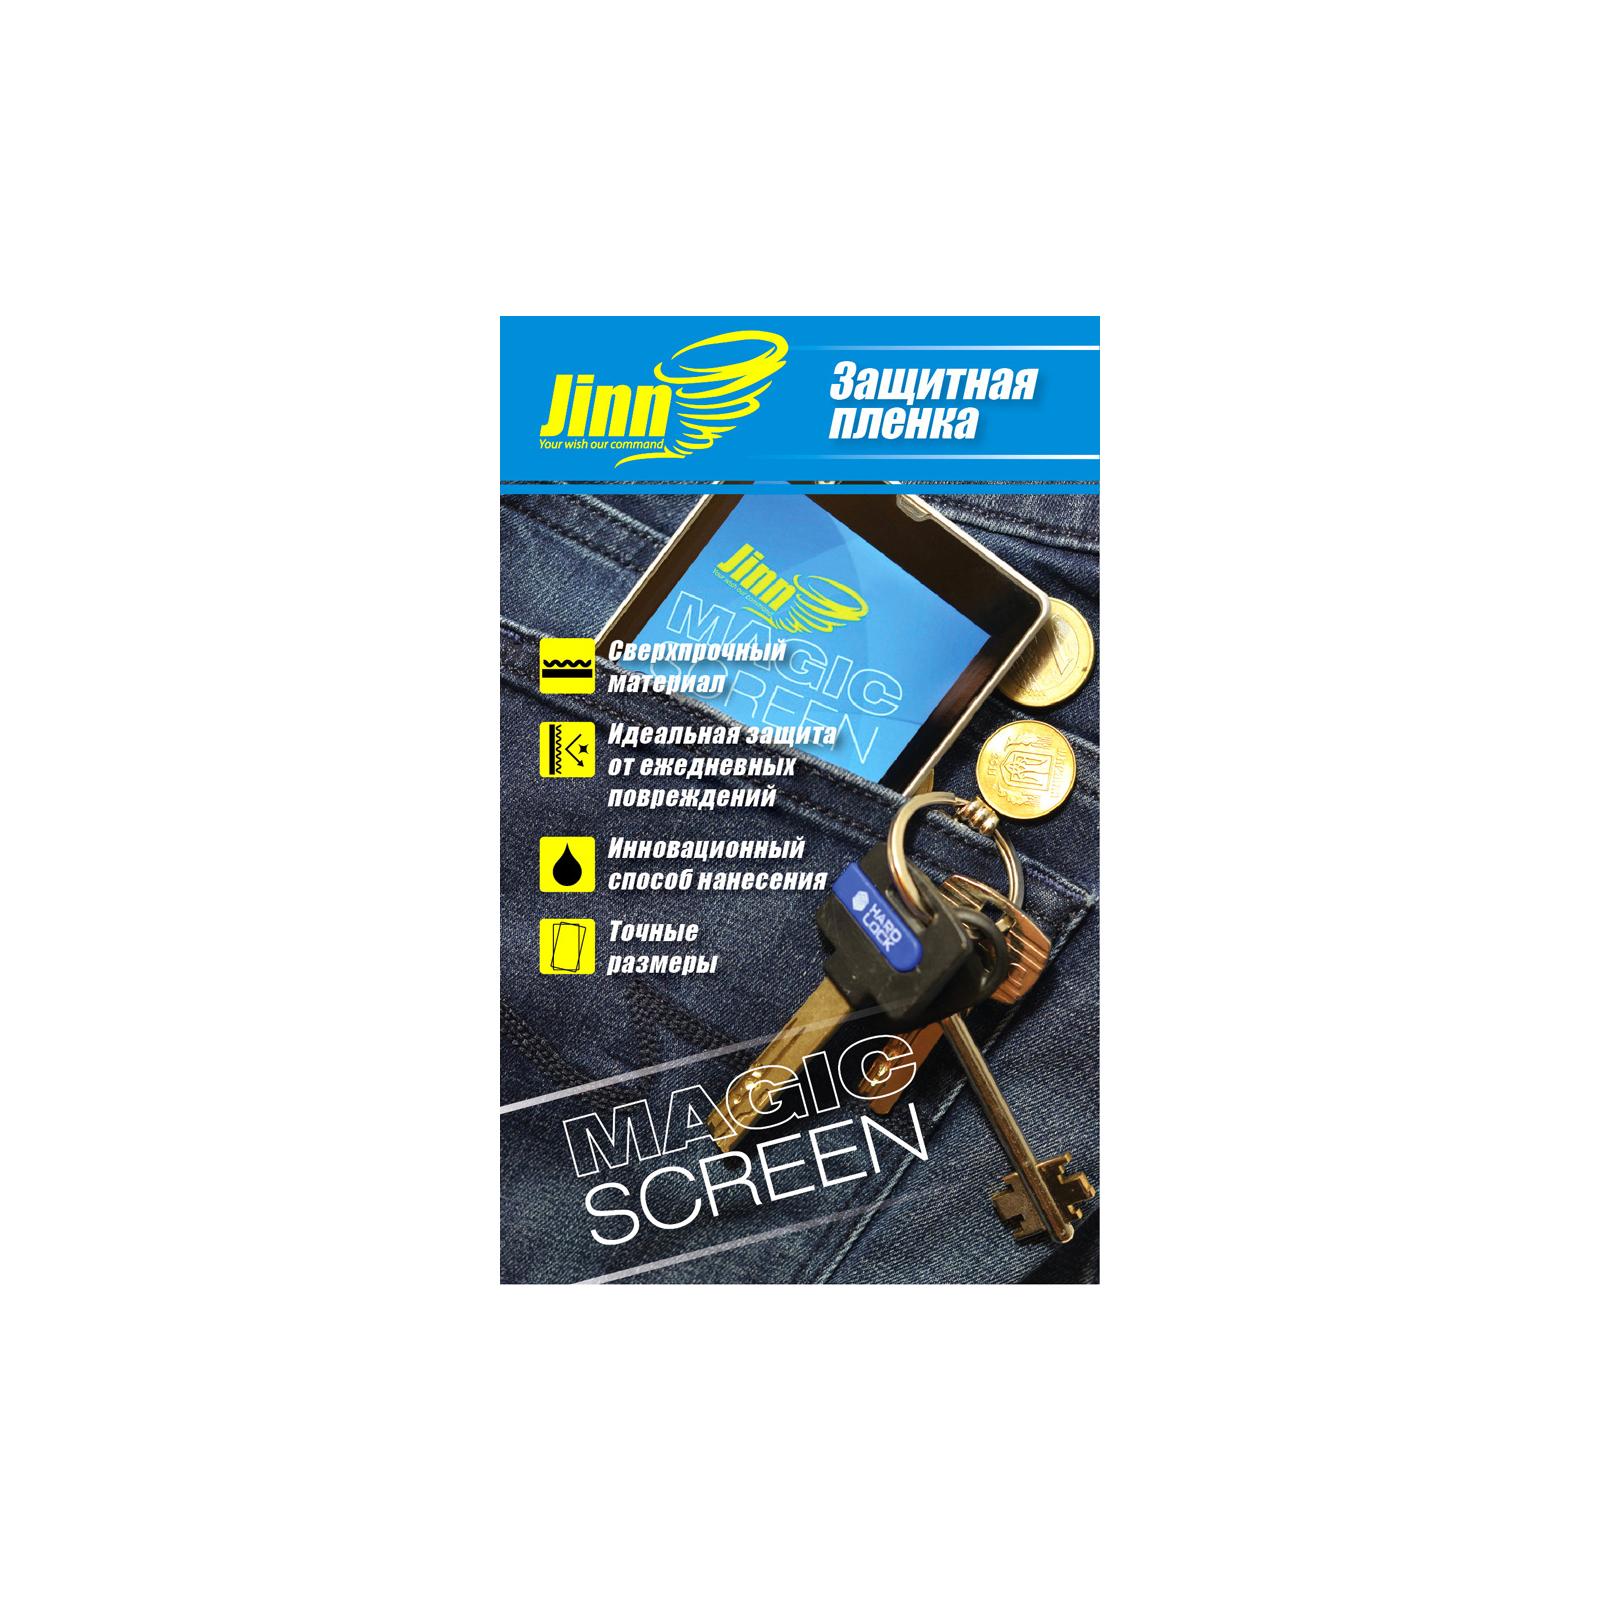 Пленка защитная JINN ультрапрочная Magic Screen для Fly IQ441 Radiance (Fly IQ441 Radiance front)